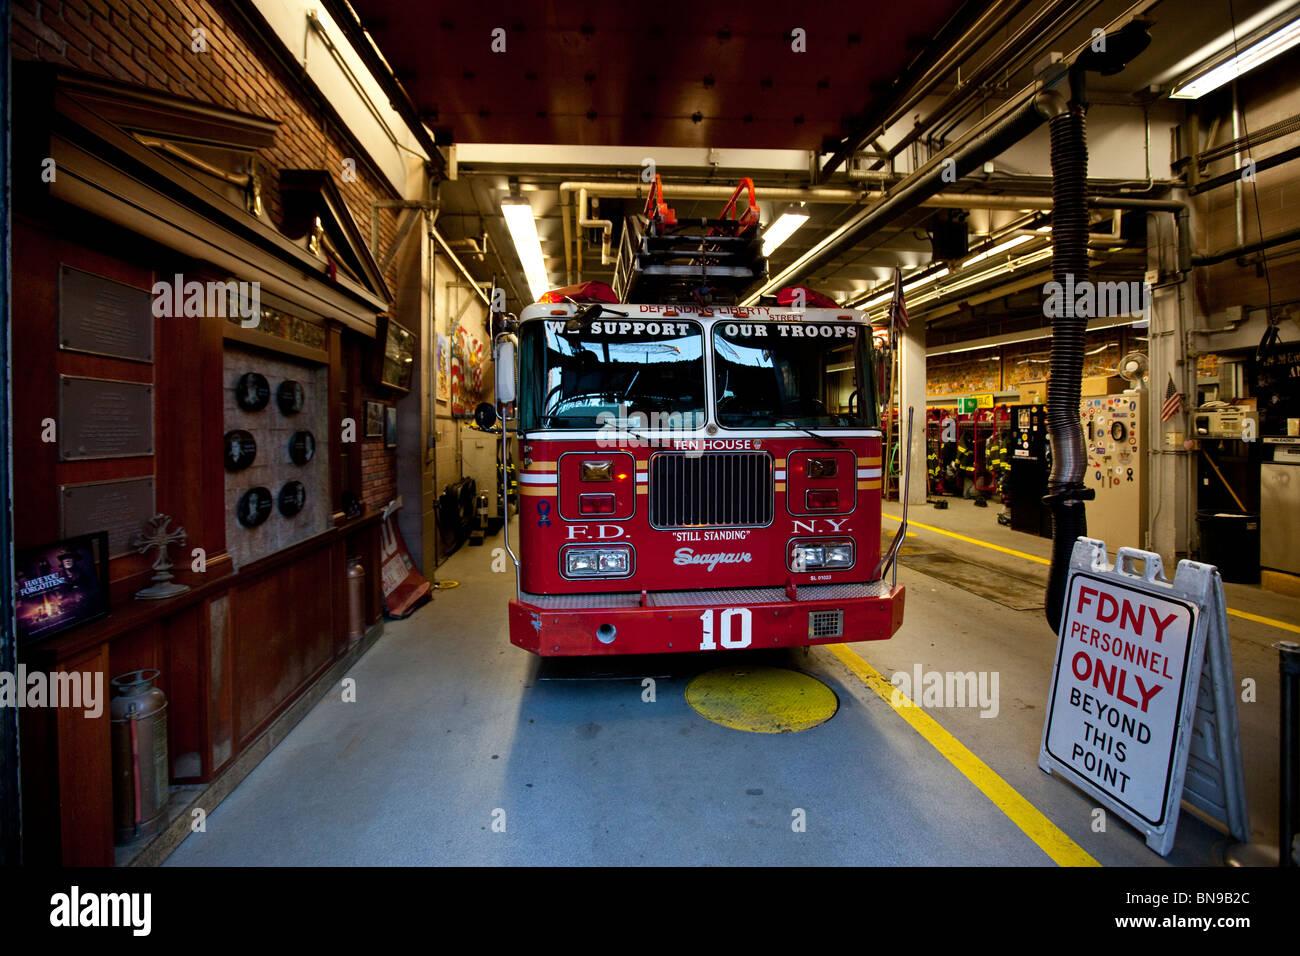 Ladder 10 Engine 10, World Trade Center Fire House, downtown Manhattan, New York City - Stock Image